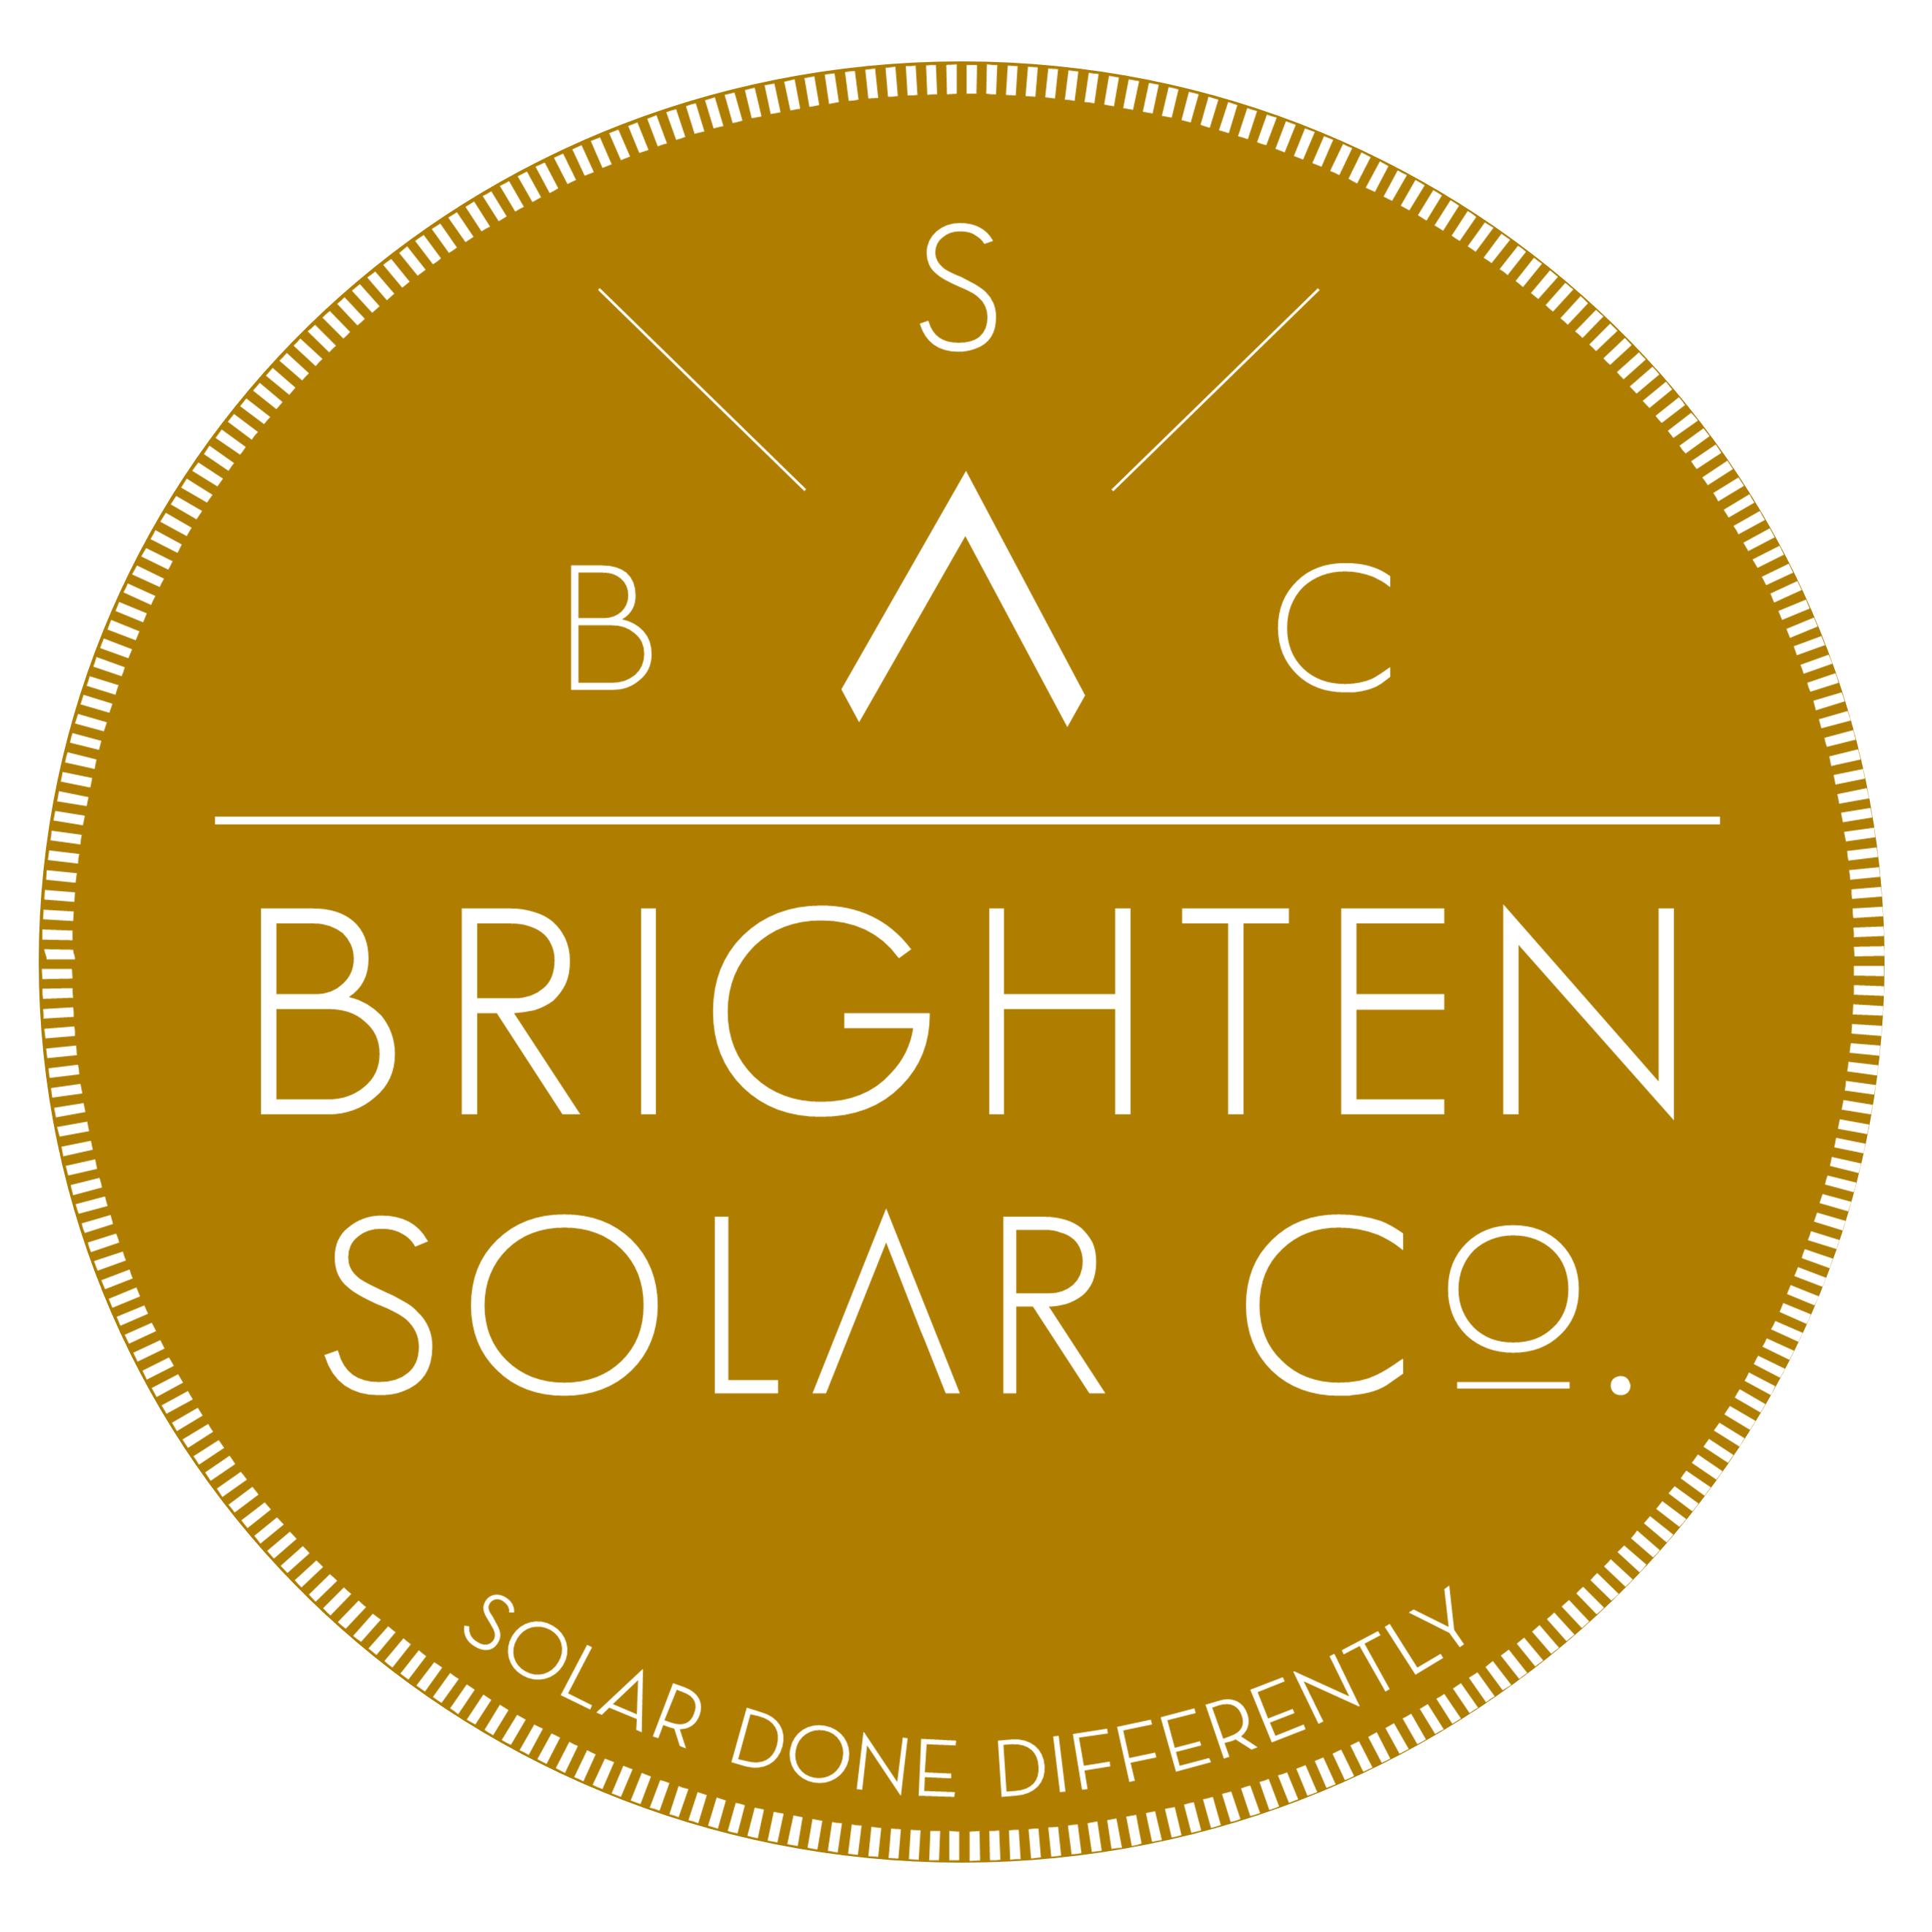 Brighten Solar Co.